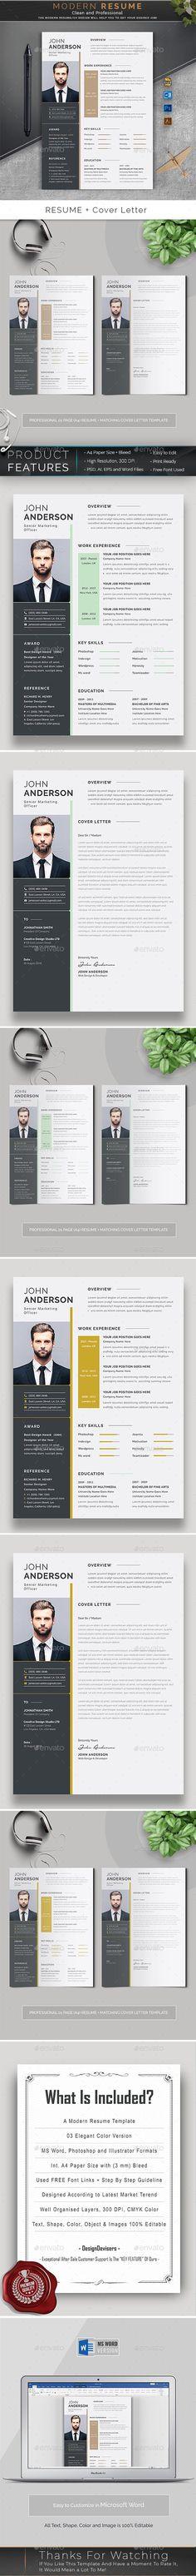 adobe illustrator software engineernig resume template